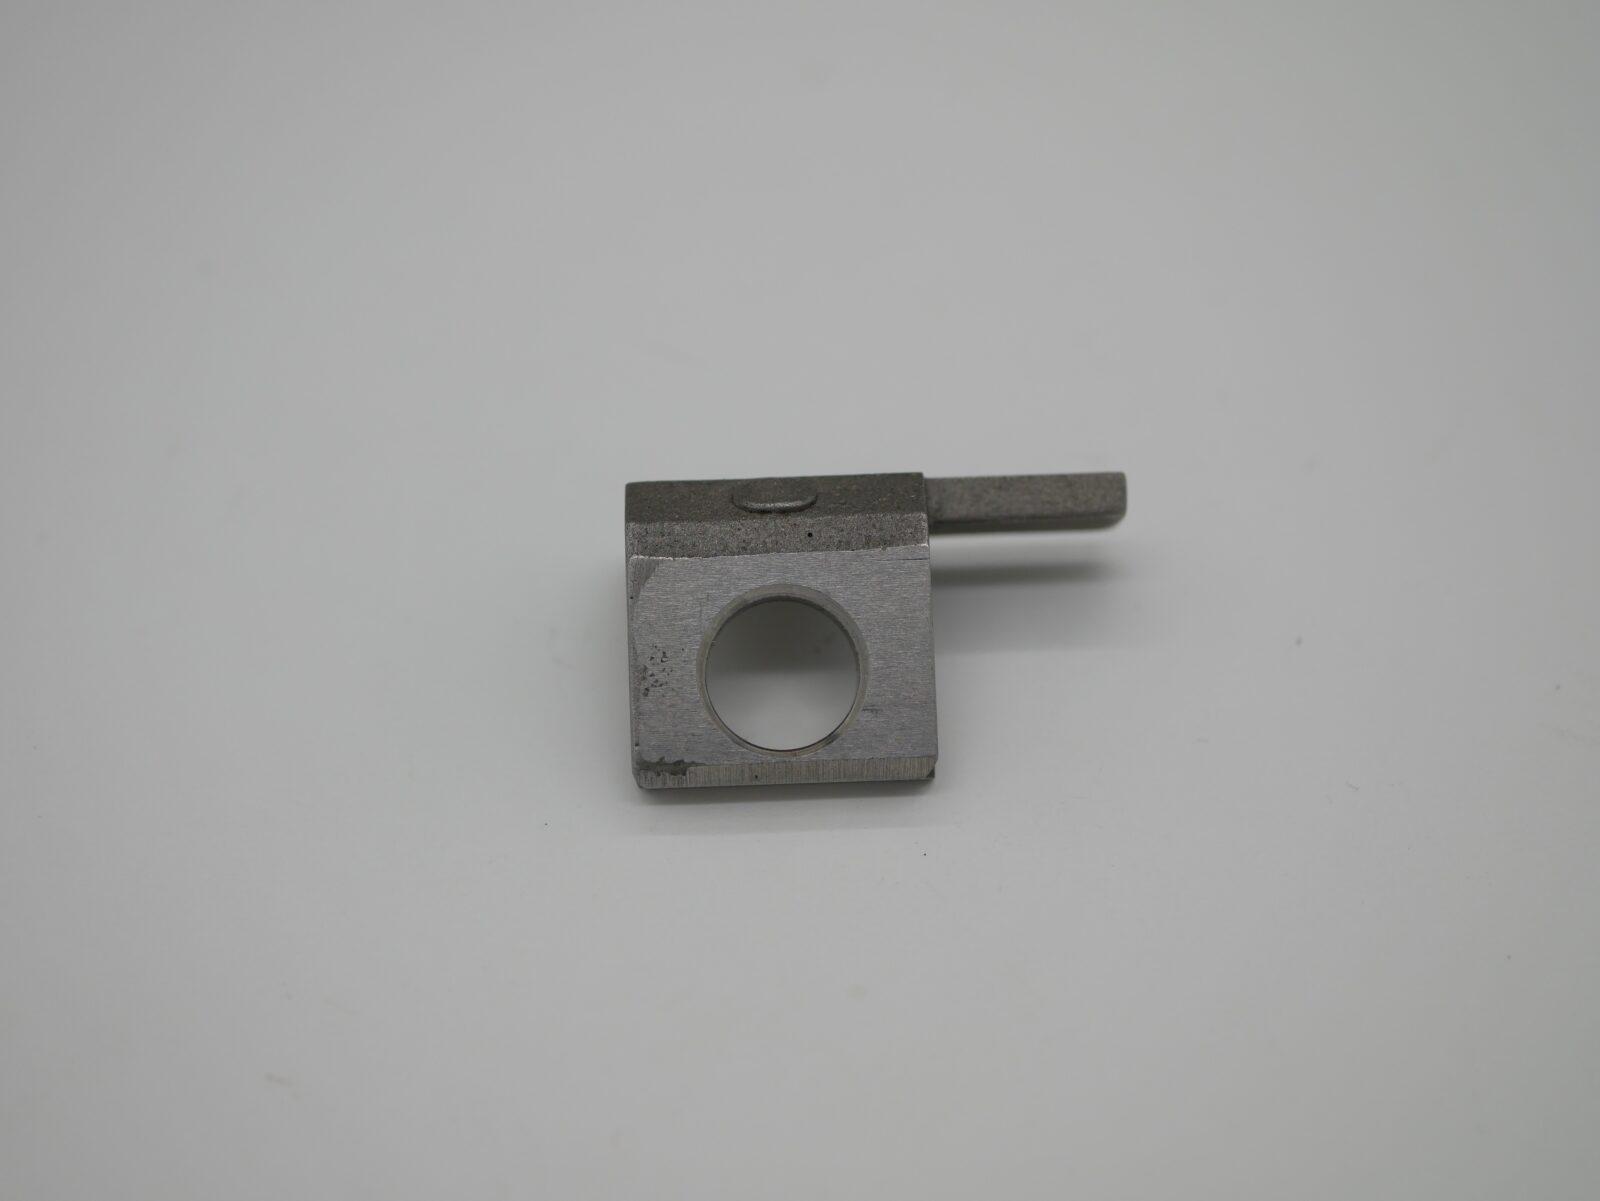 XL105 Steel Winged Transfer Gripper R/H HDM: F4.005.125